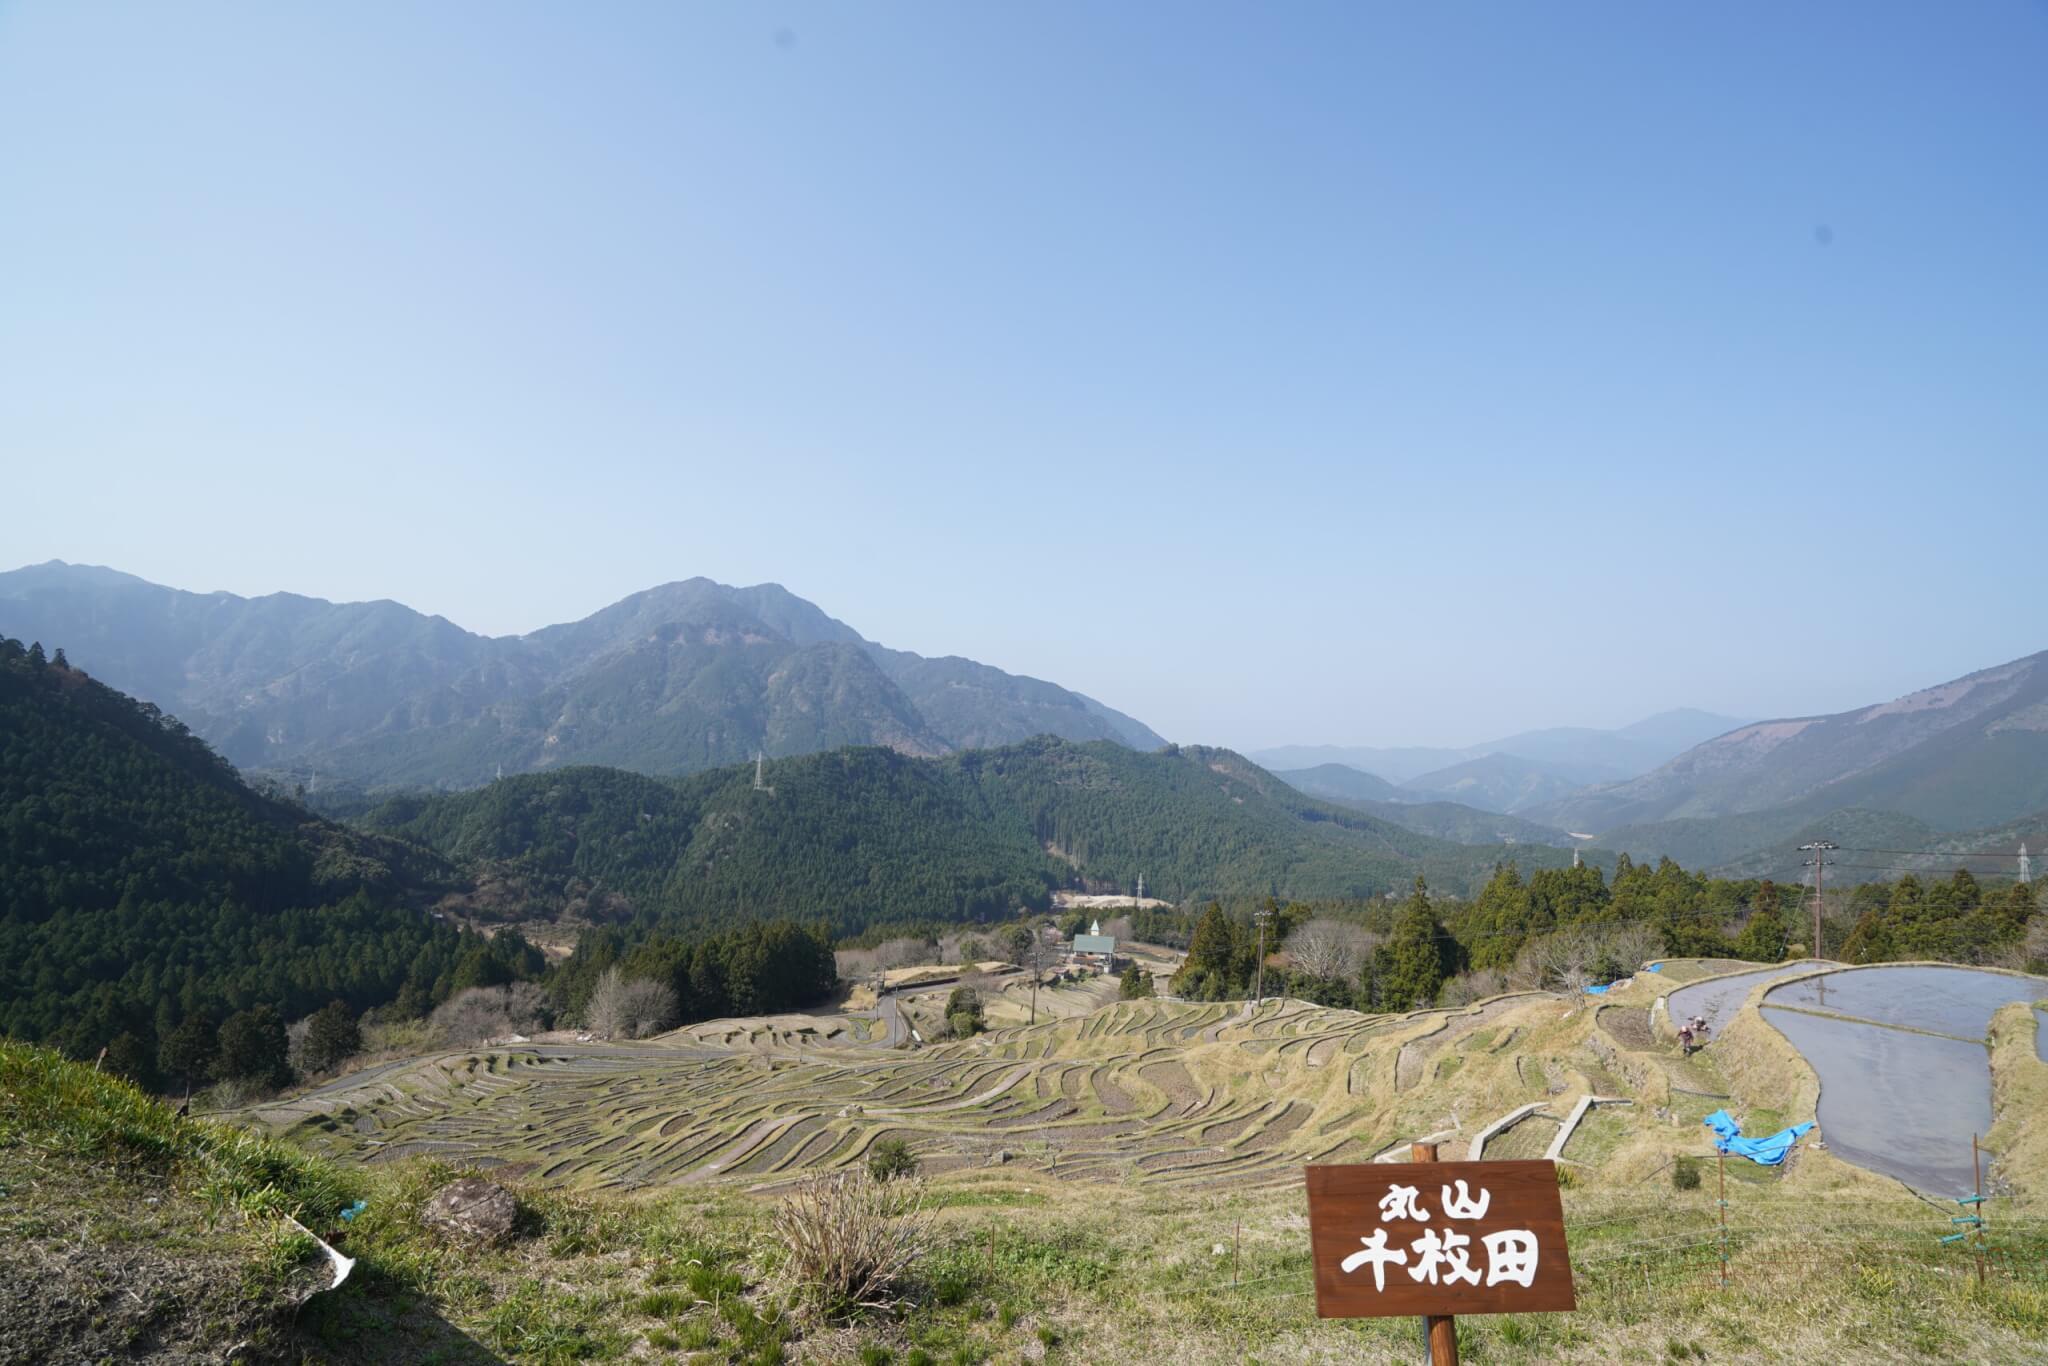 DSC00796 scaled - 【三重】日本一の棚田!?丸山千枚田に行ってみよう!